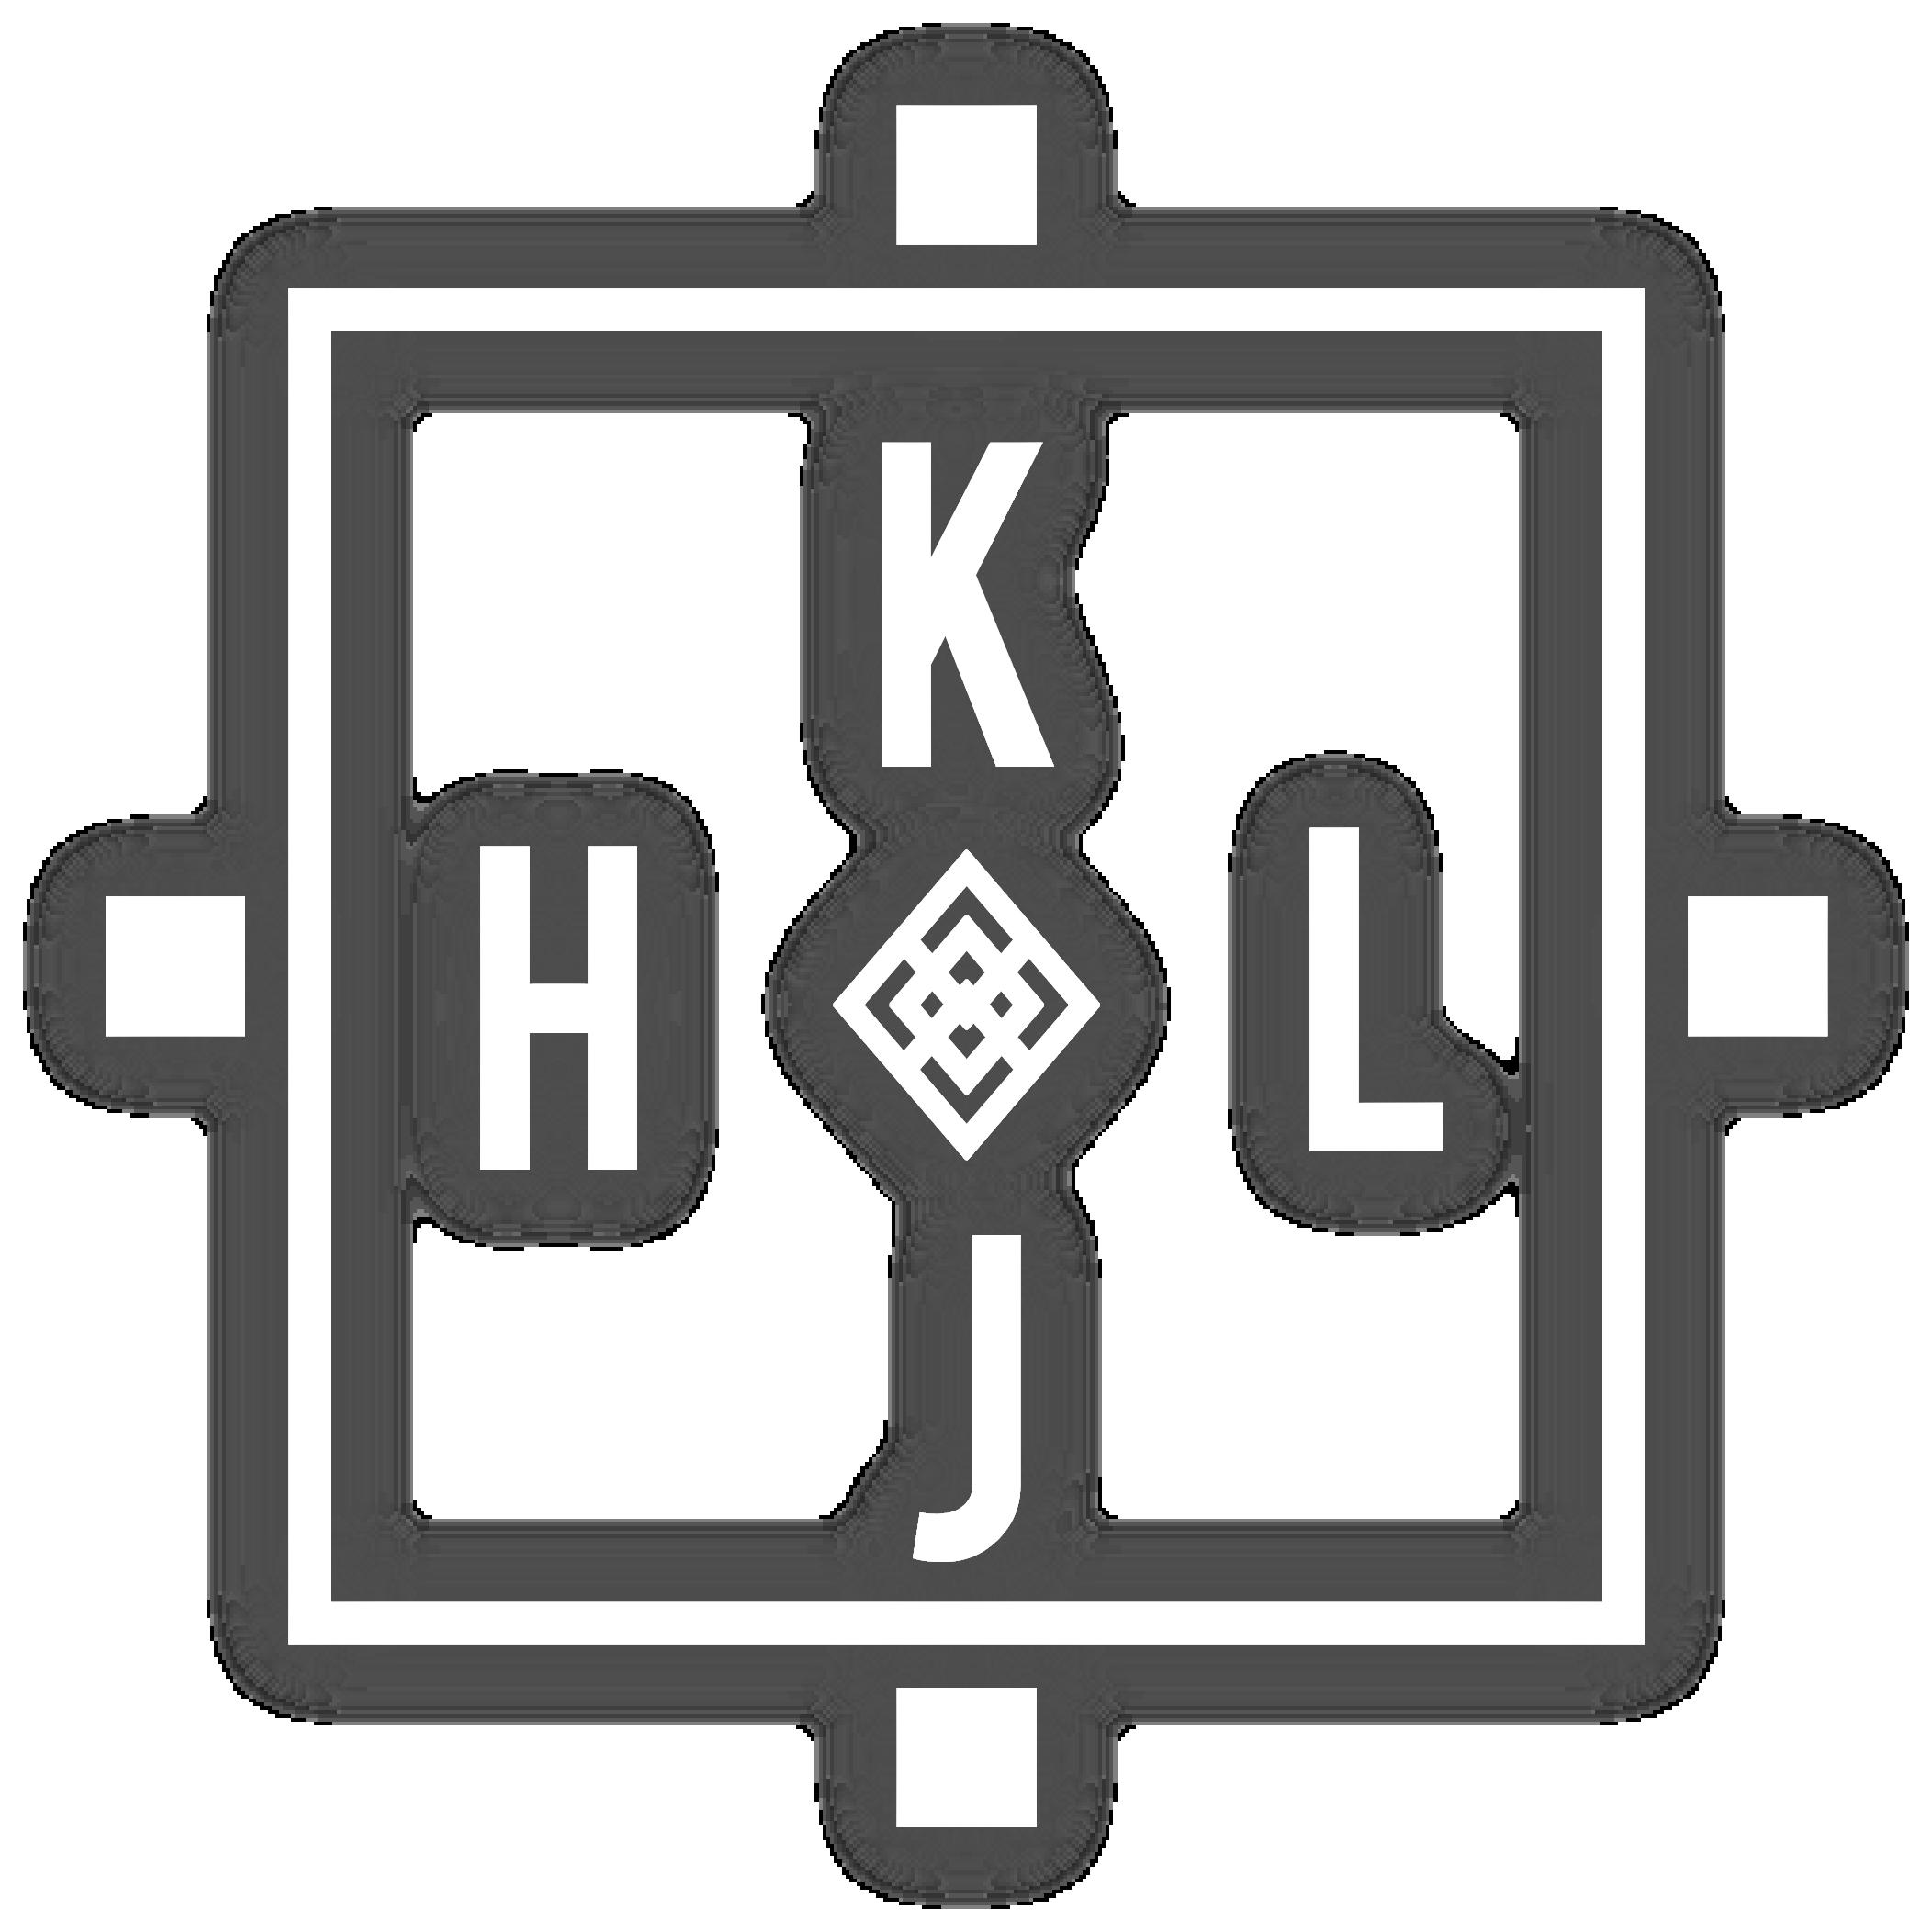 HL Designs